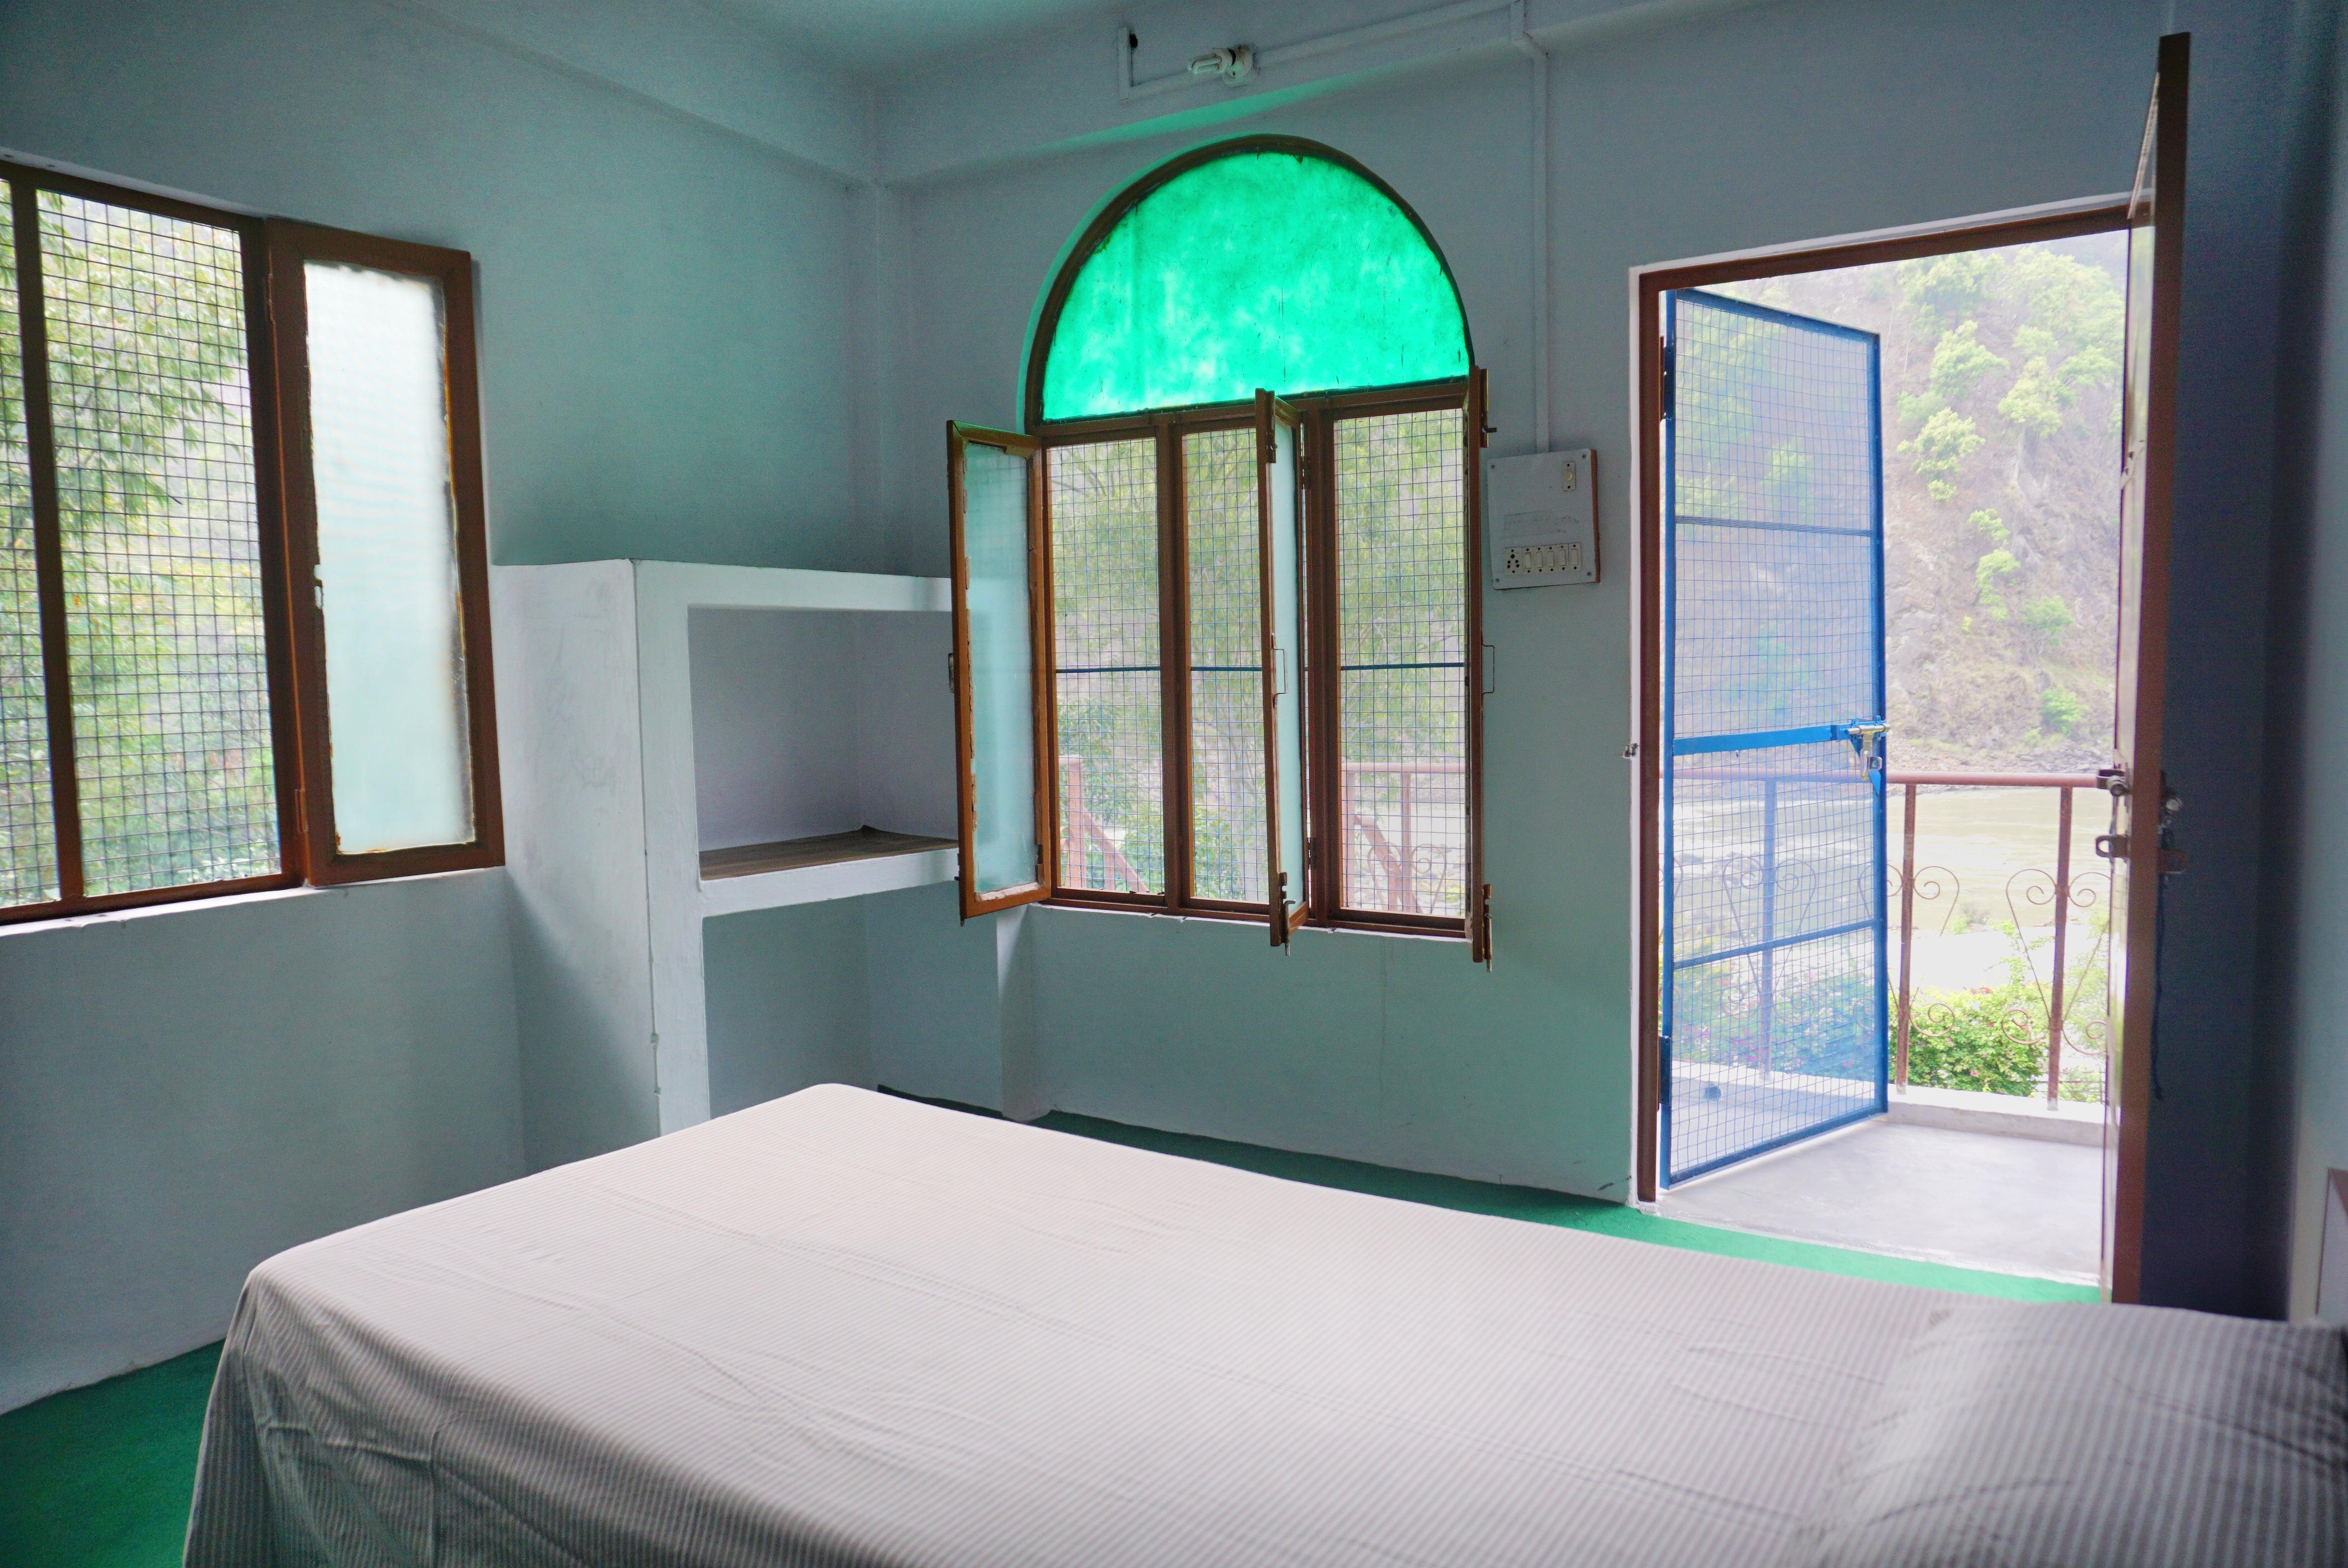 Ganga View Room at Phool Chatti Yoga Ashram in Rishikesh